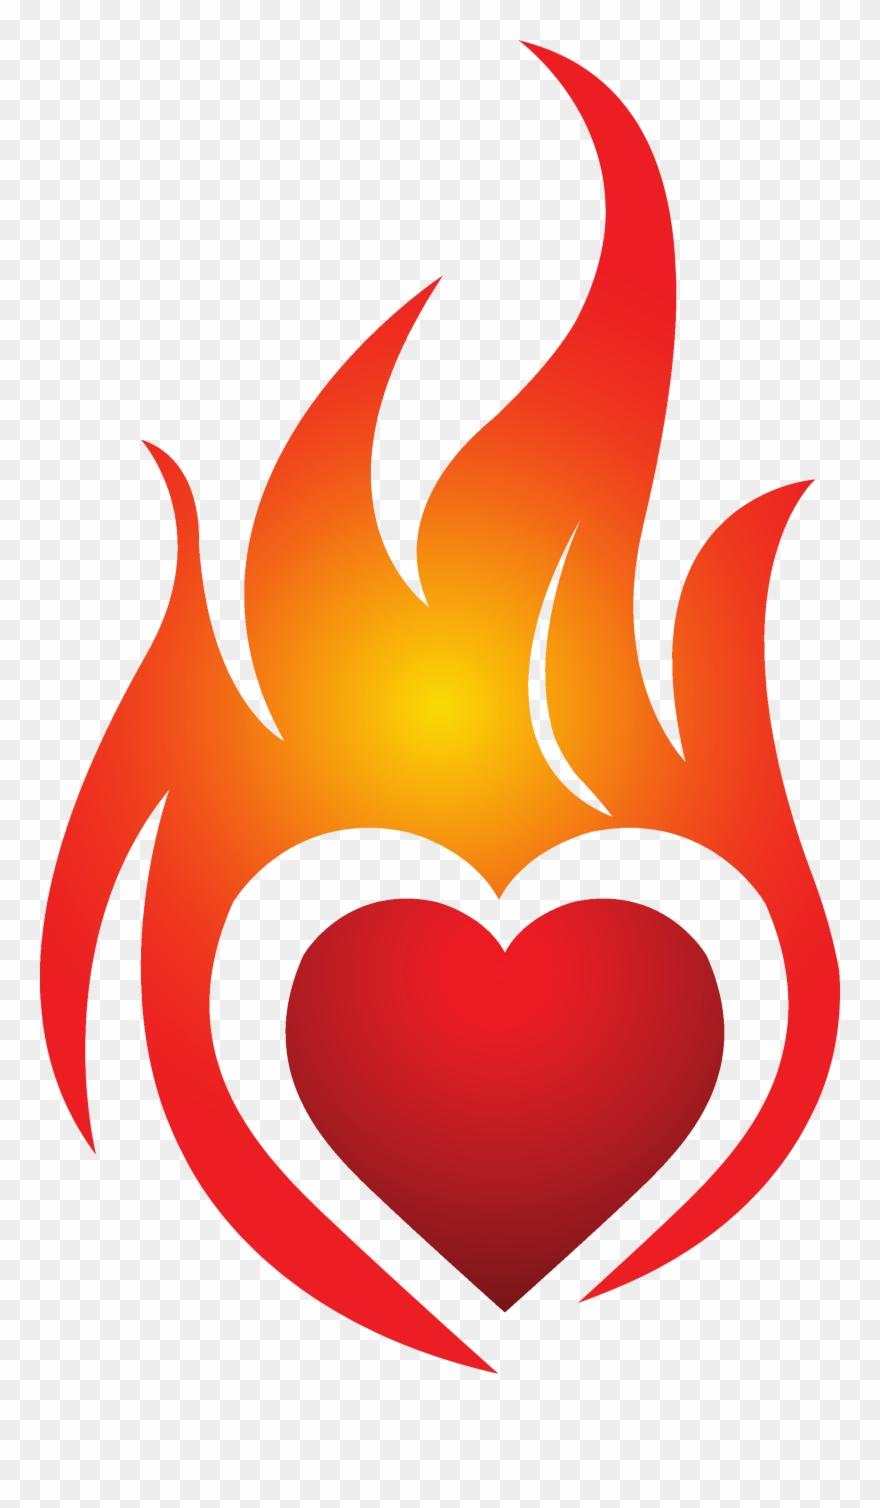 Heart On Fire Jpg Royalty Free Stock Techflourish.